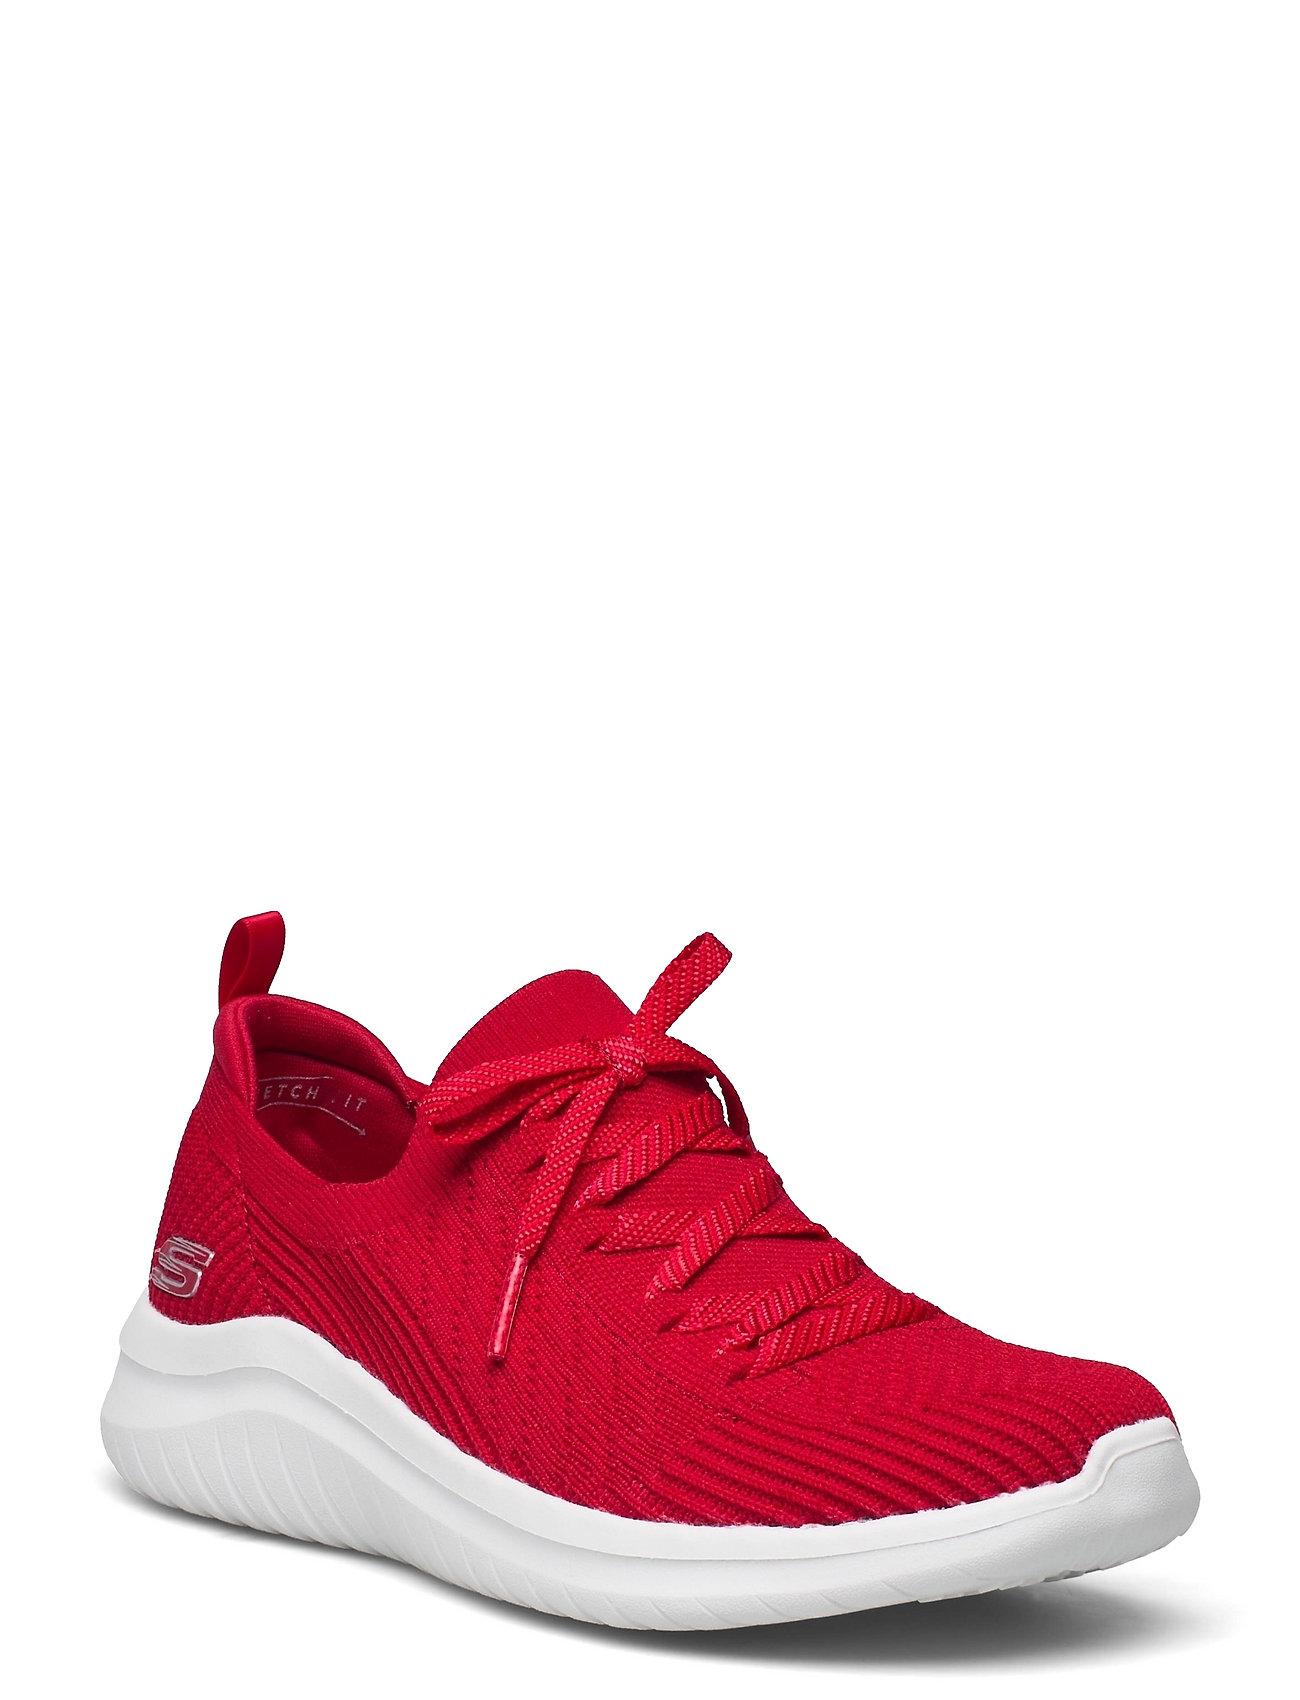 Womens Ultra Flex 2.0 - Flash Illusion Low-top Sneakers Rød Skechers